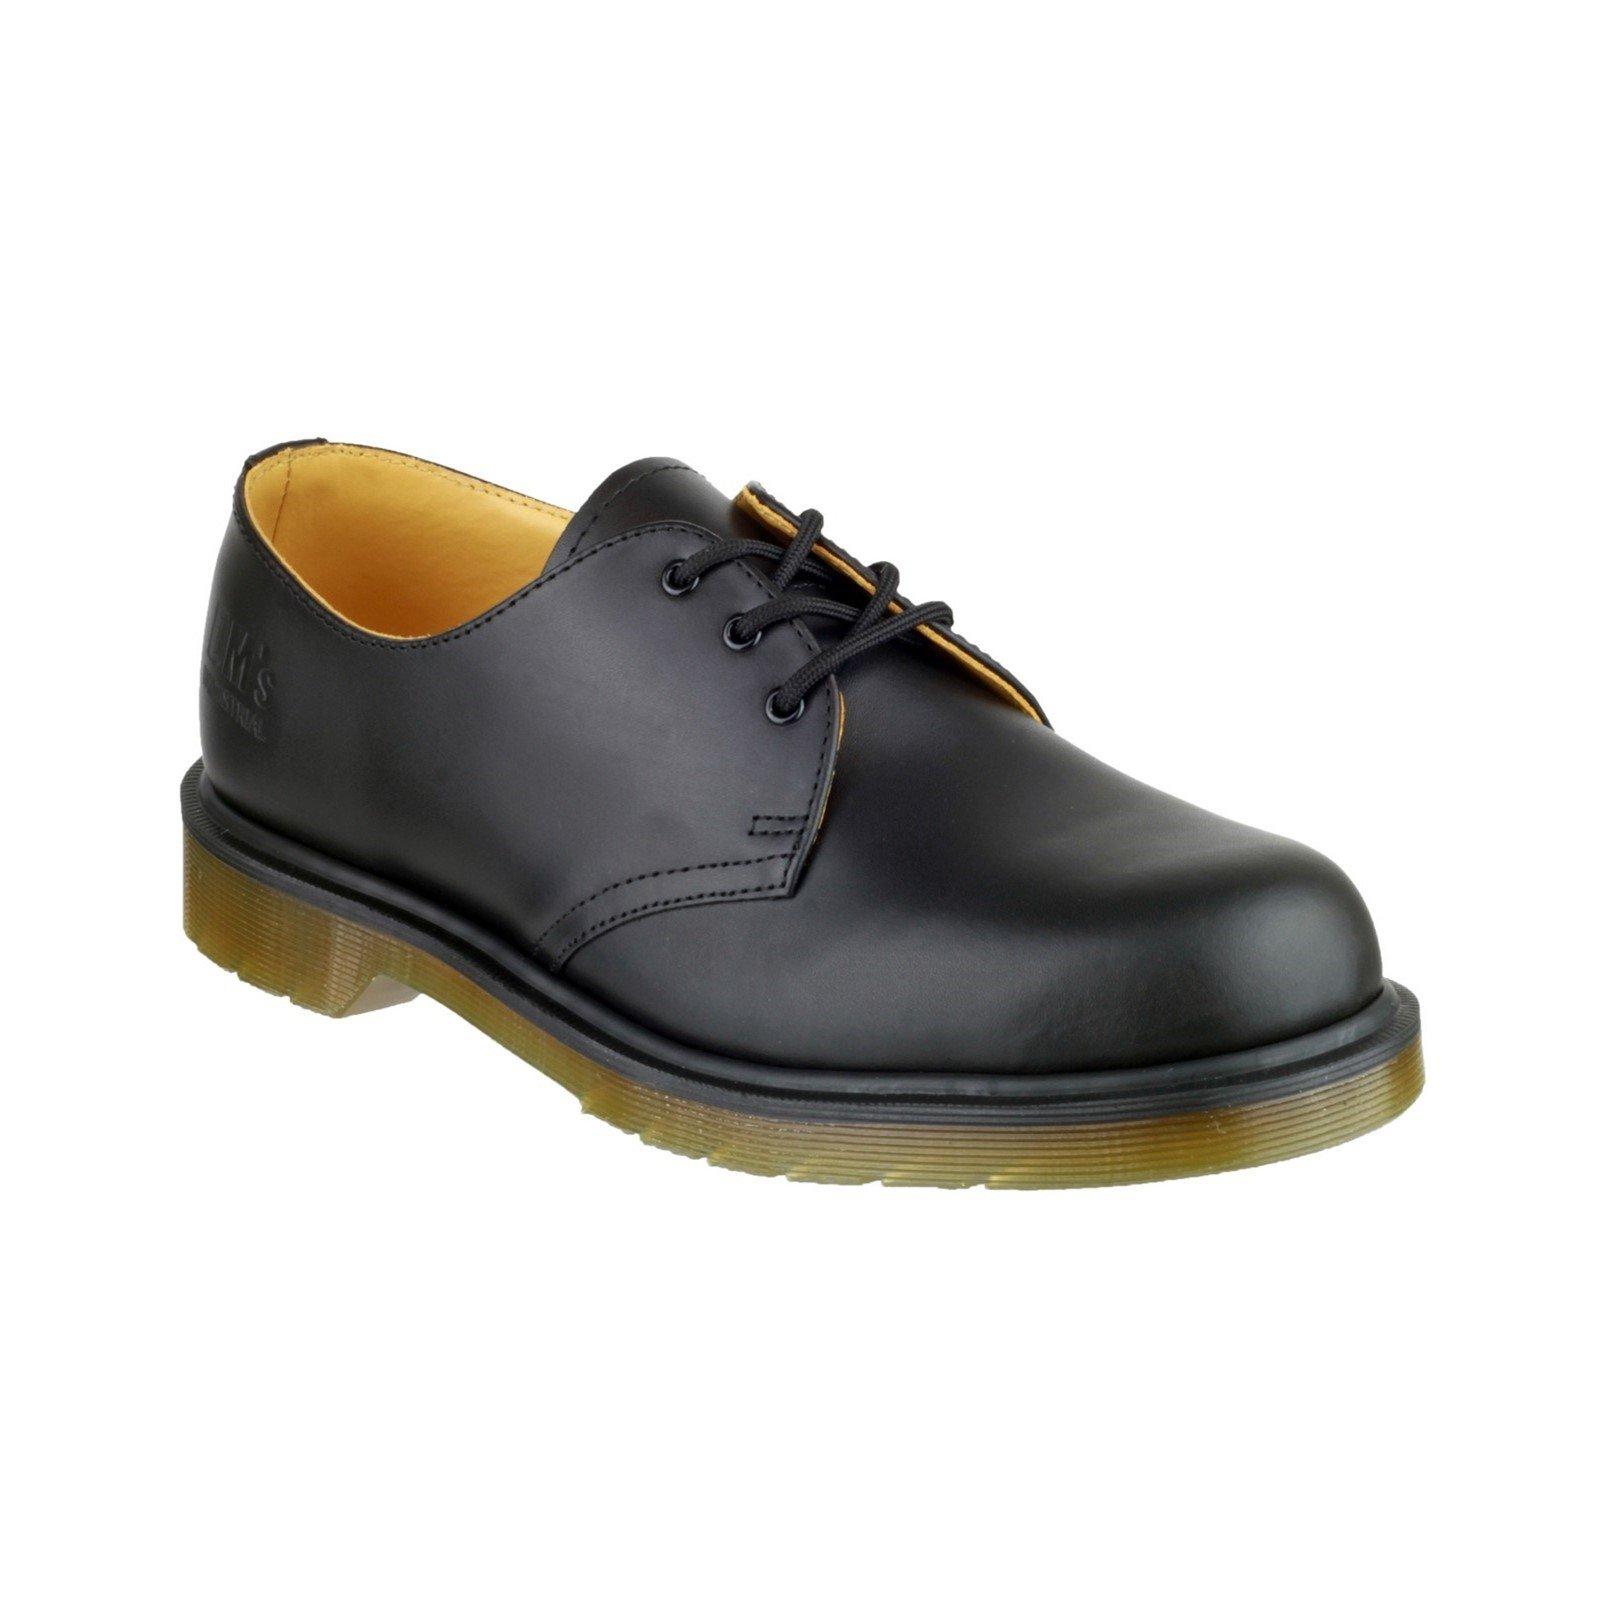 Dr Martens Men's Lace-Up Leather Derby Shoe Black 04915 - Black 4